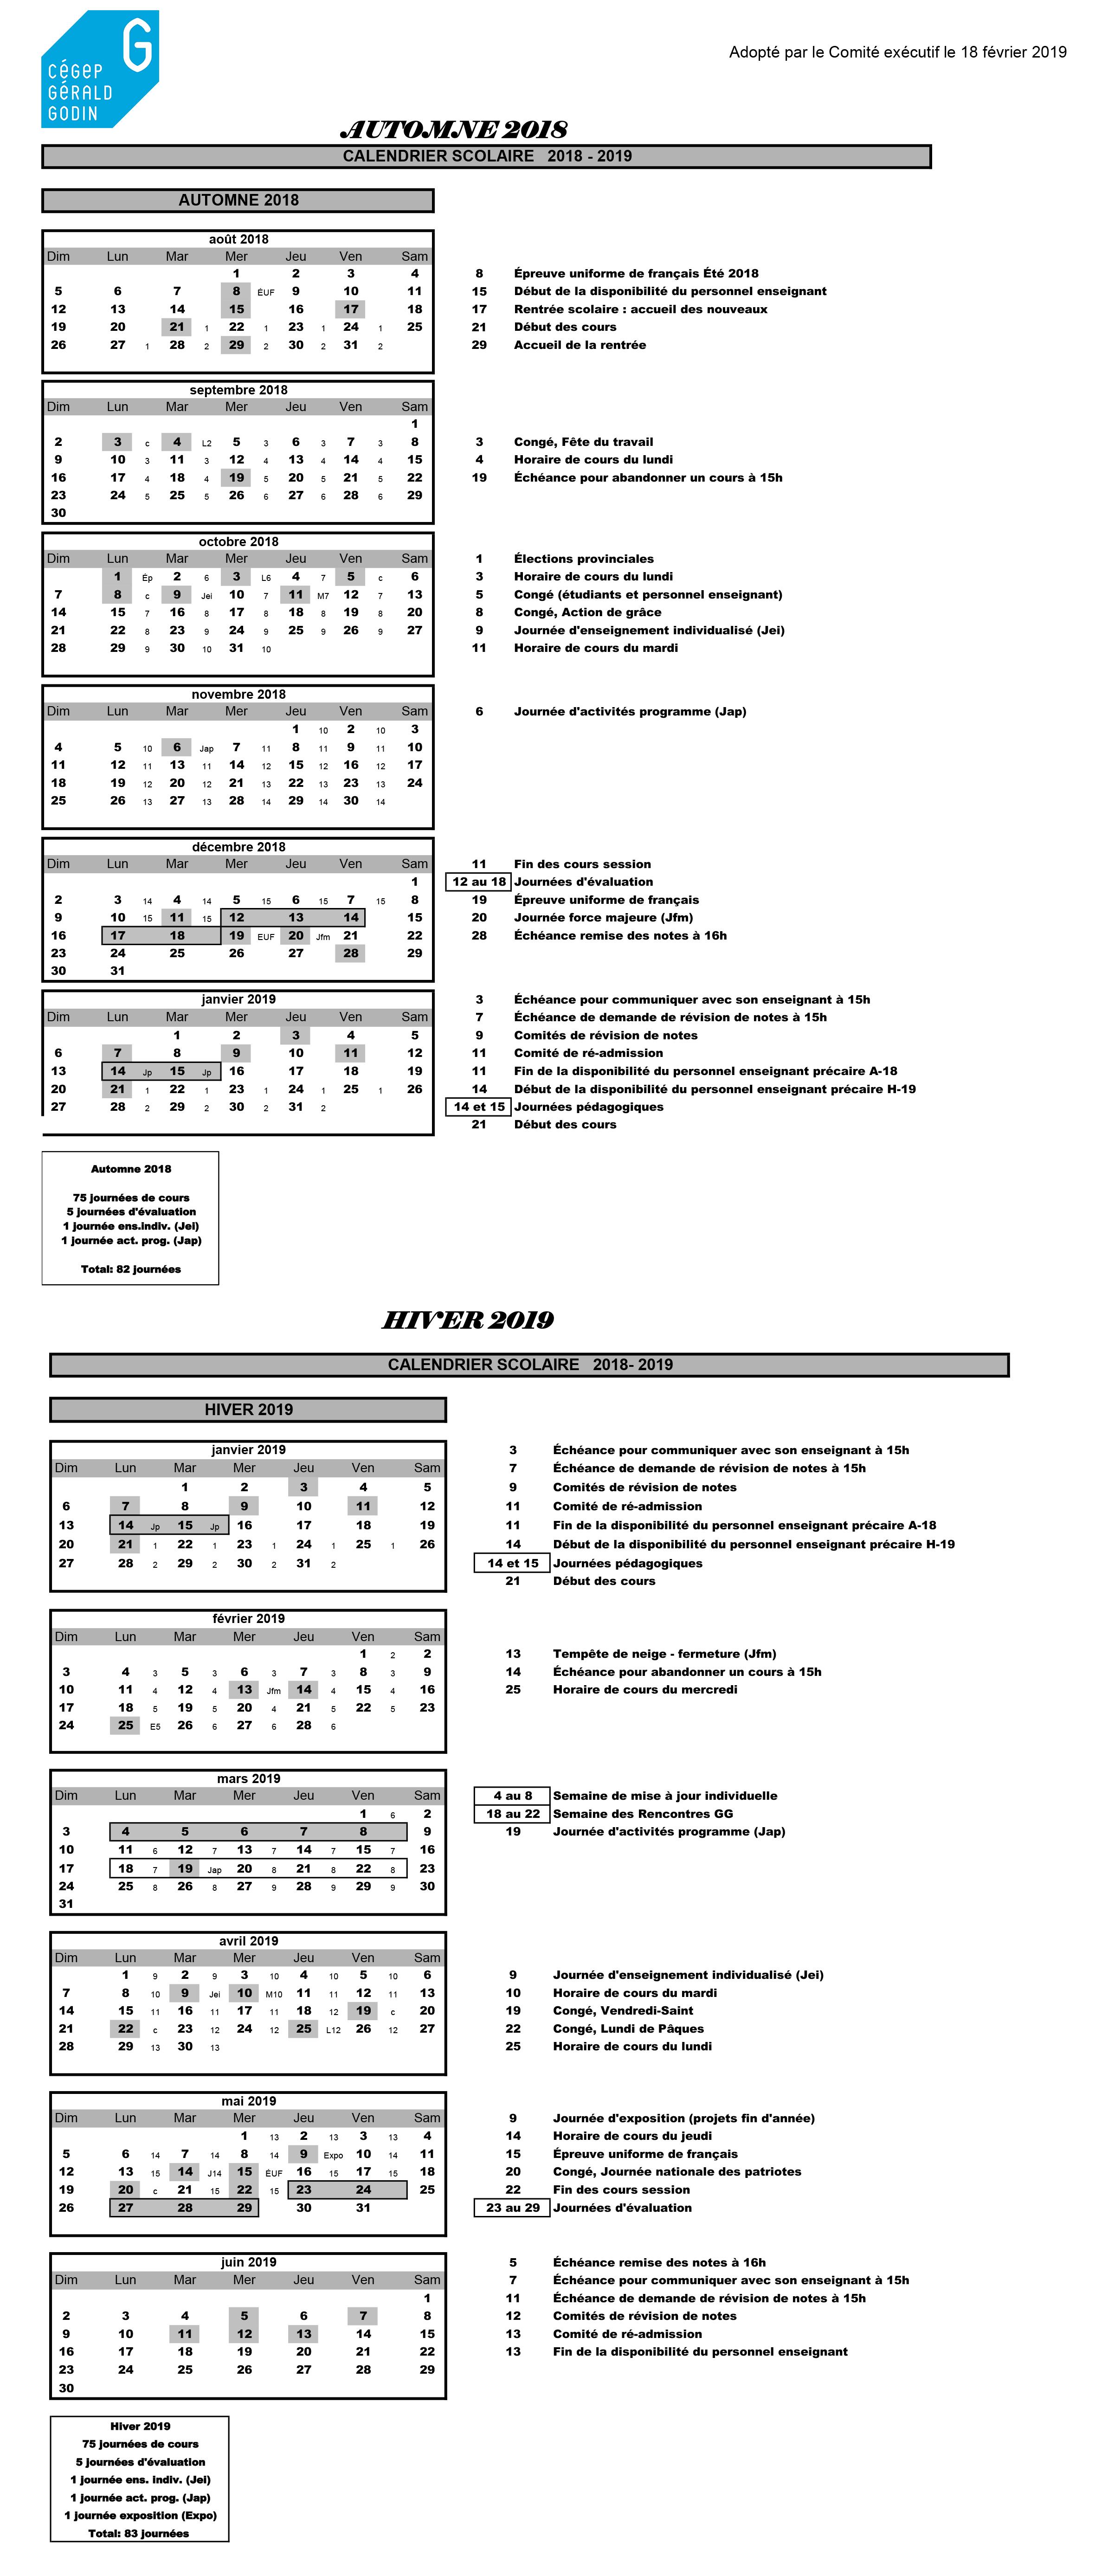 Calendrier-scolaire-2018-2019